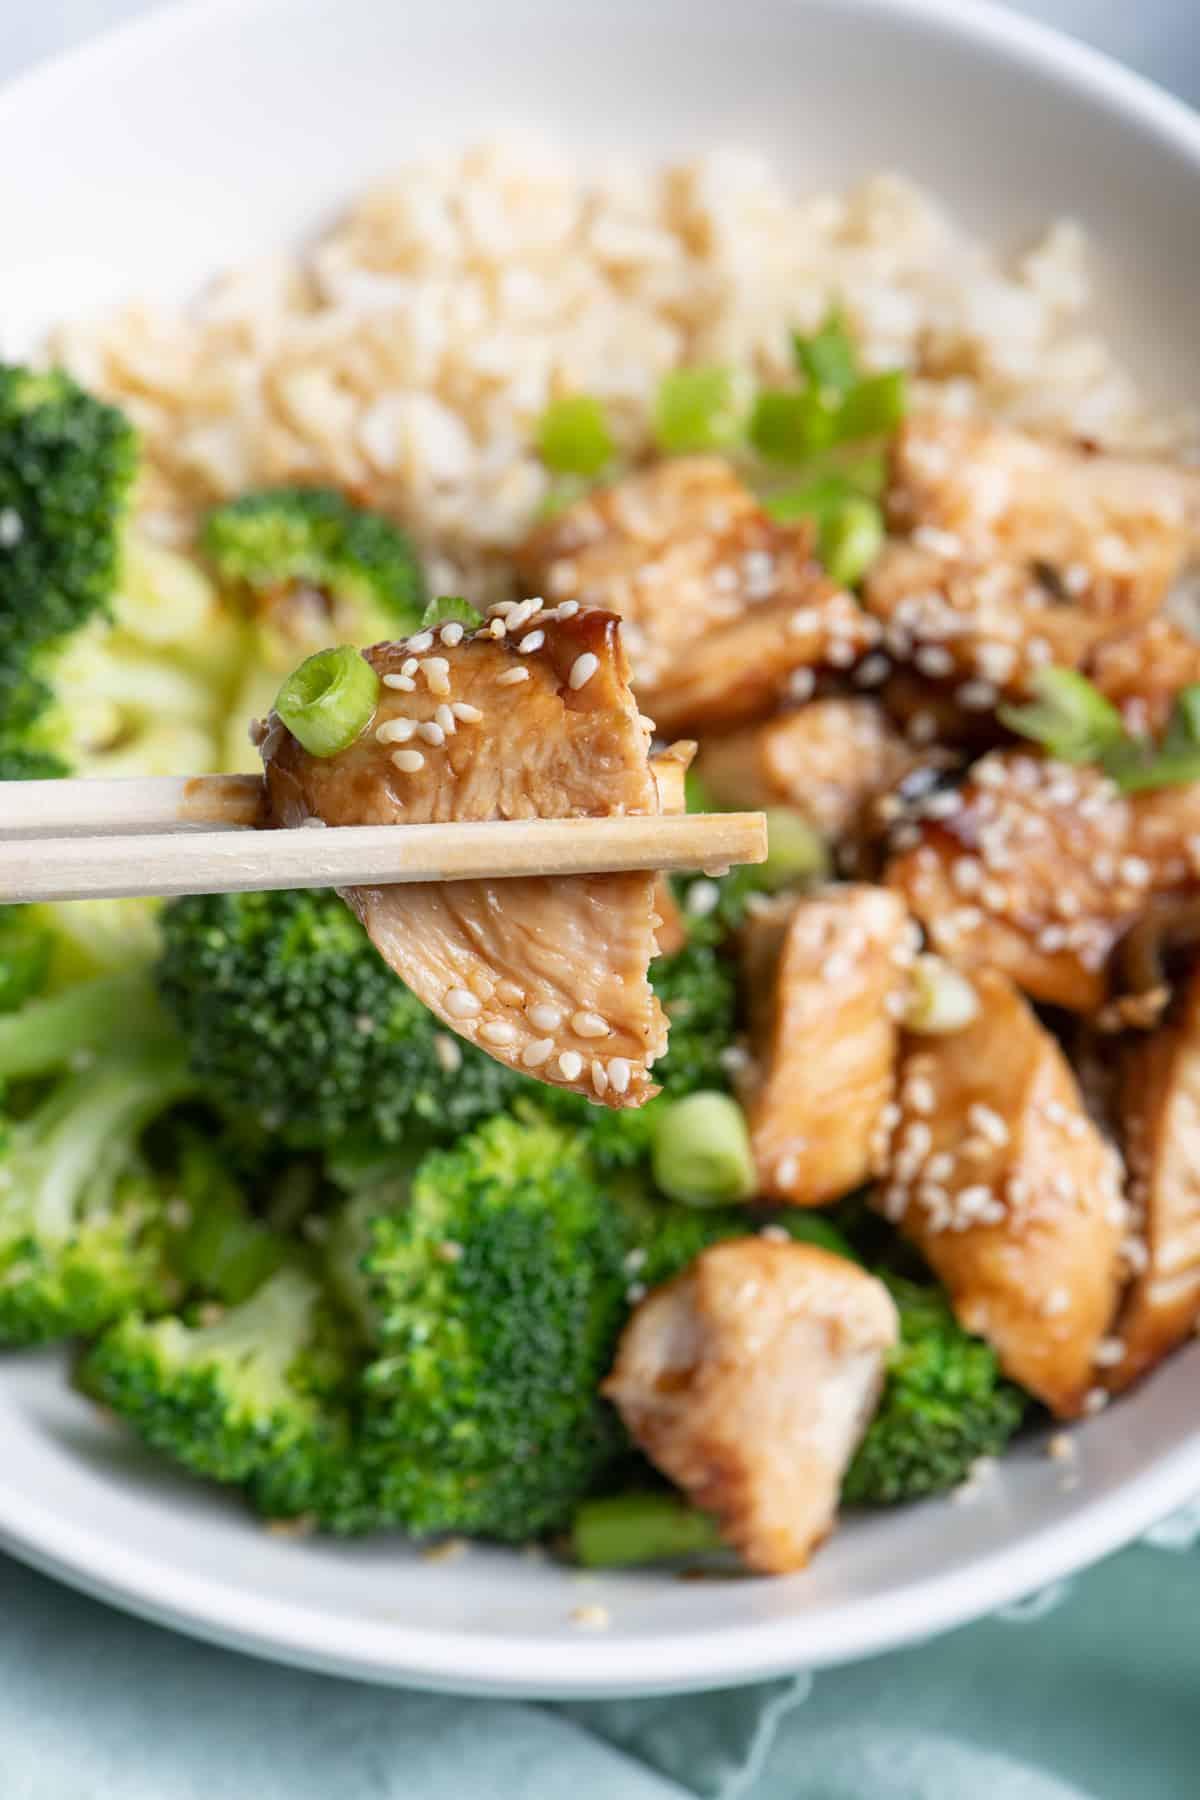 Close up shot of chopsticks picking up cubed chicken in chicken teriyaki bowl